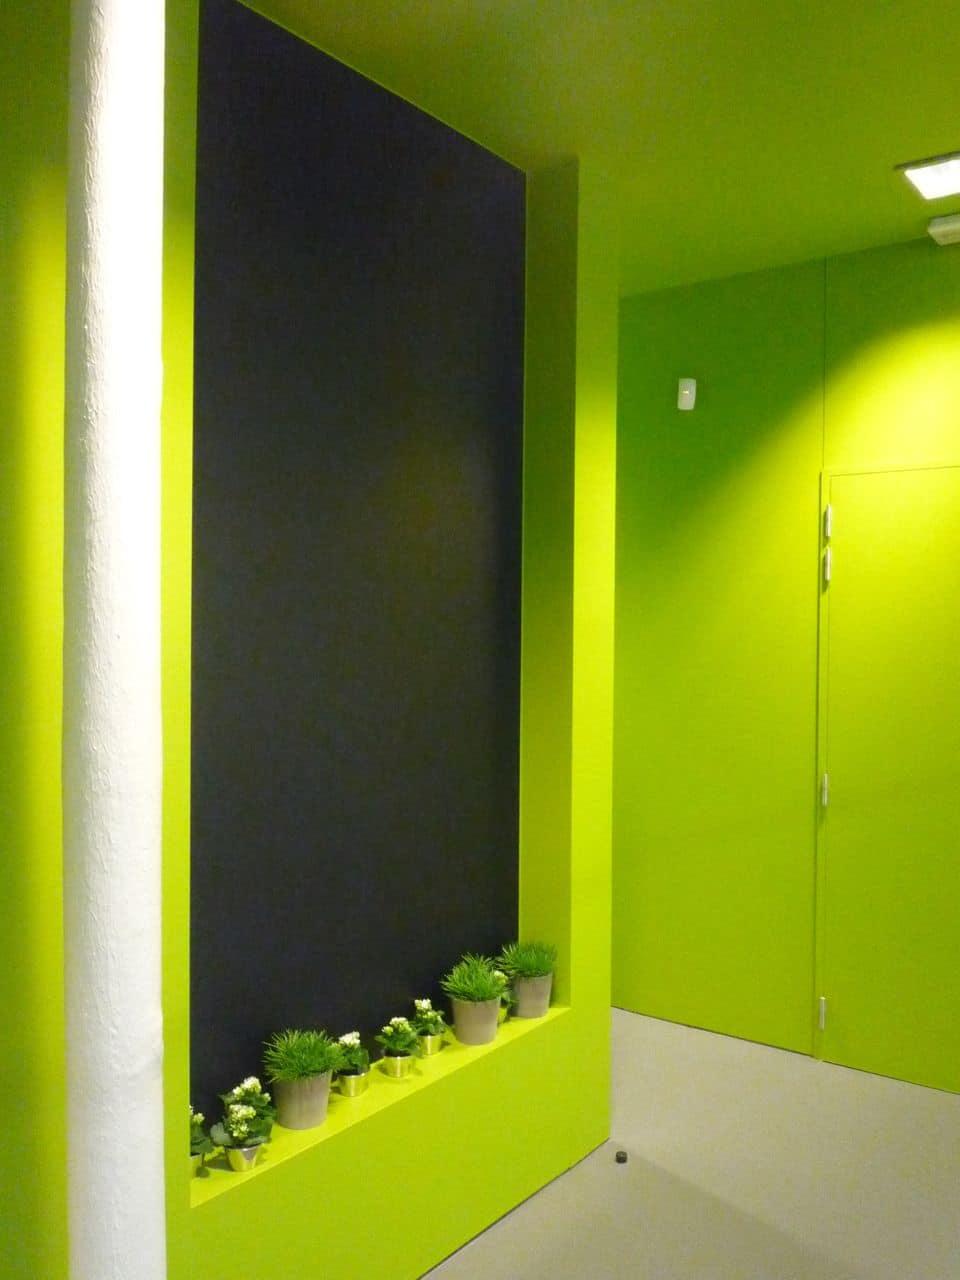 P1060738 | Baeyens & Beck architecten Gent | architect nieuwbouw renovatie interieur | high end | architectenbureau